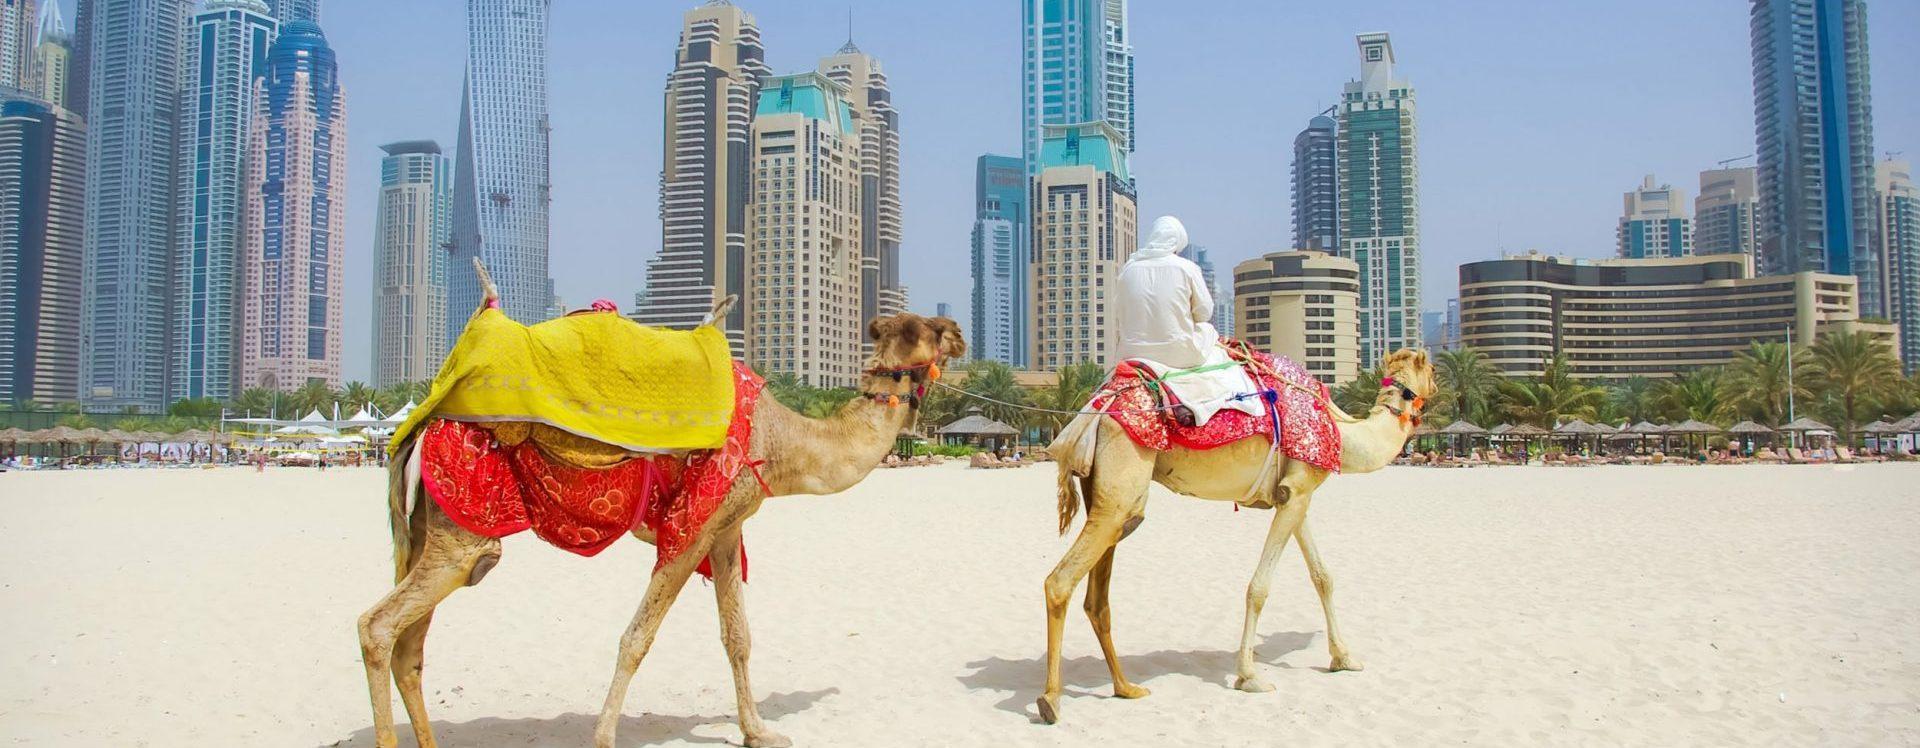 Dubai_shutterstock_100971232